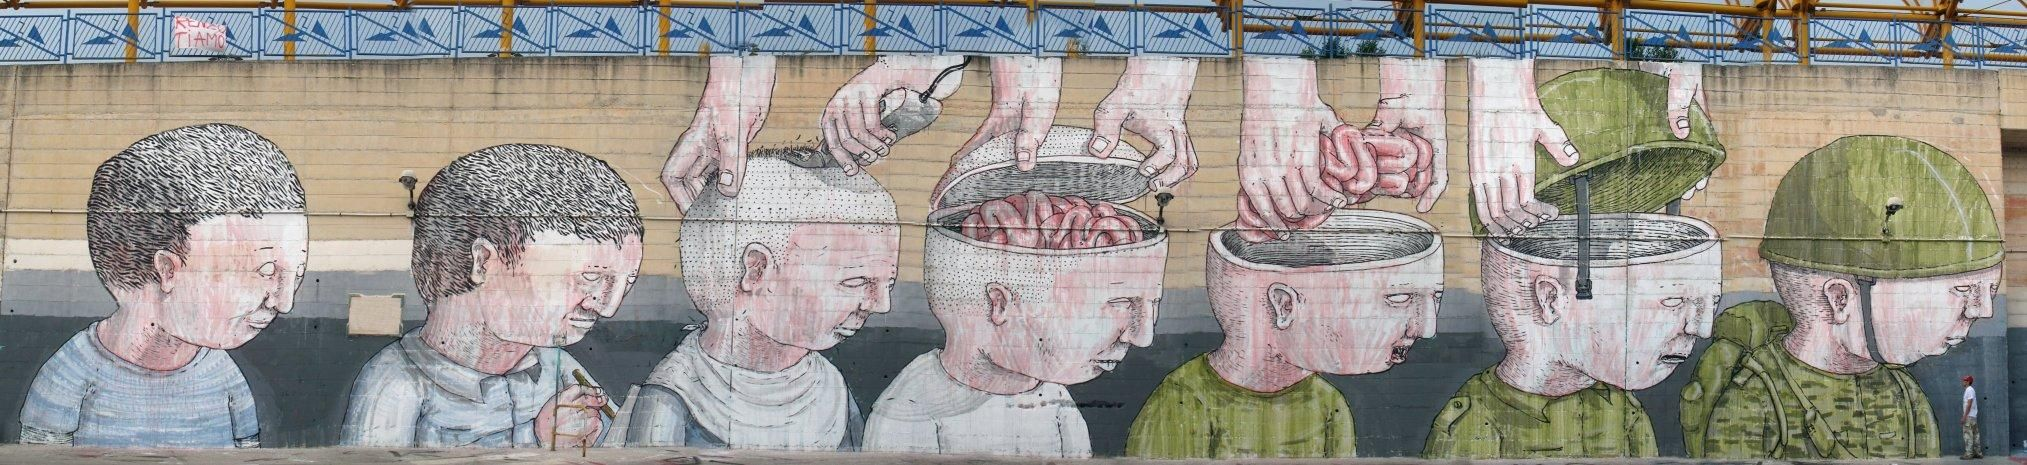 Blu The Brainwash Soldiers Street Art Activist Art Street Artists